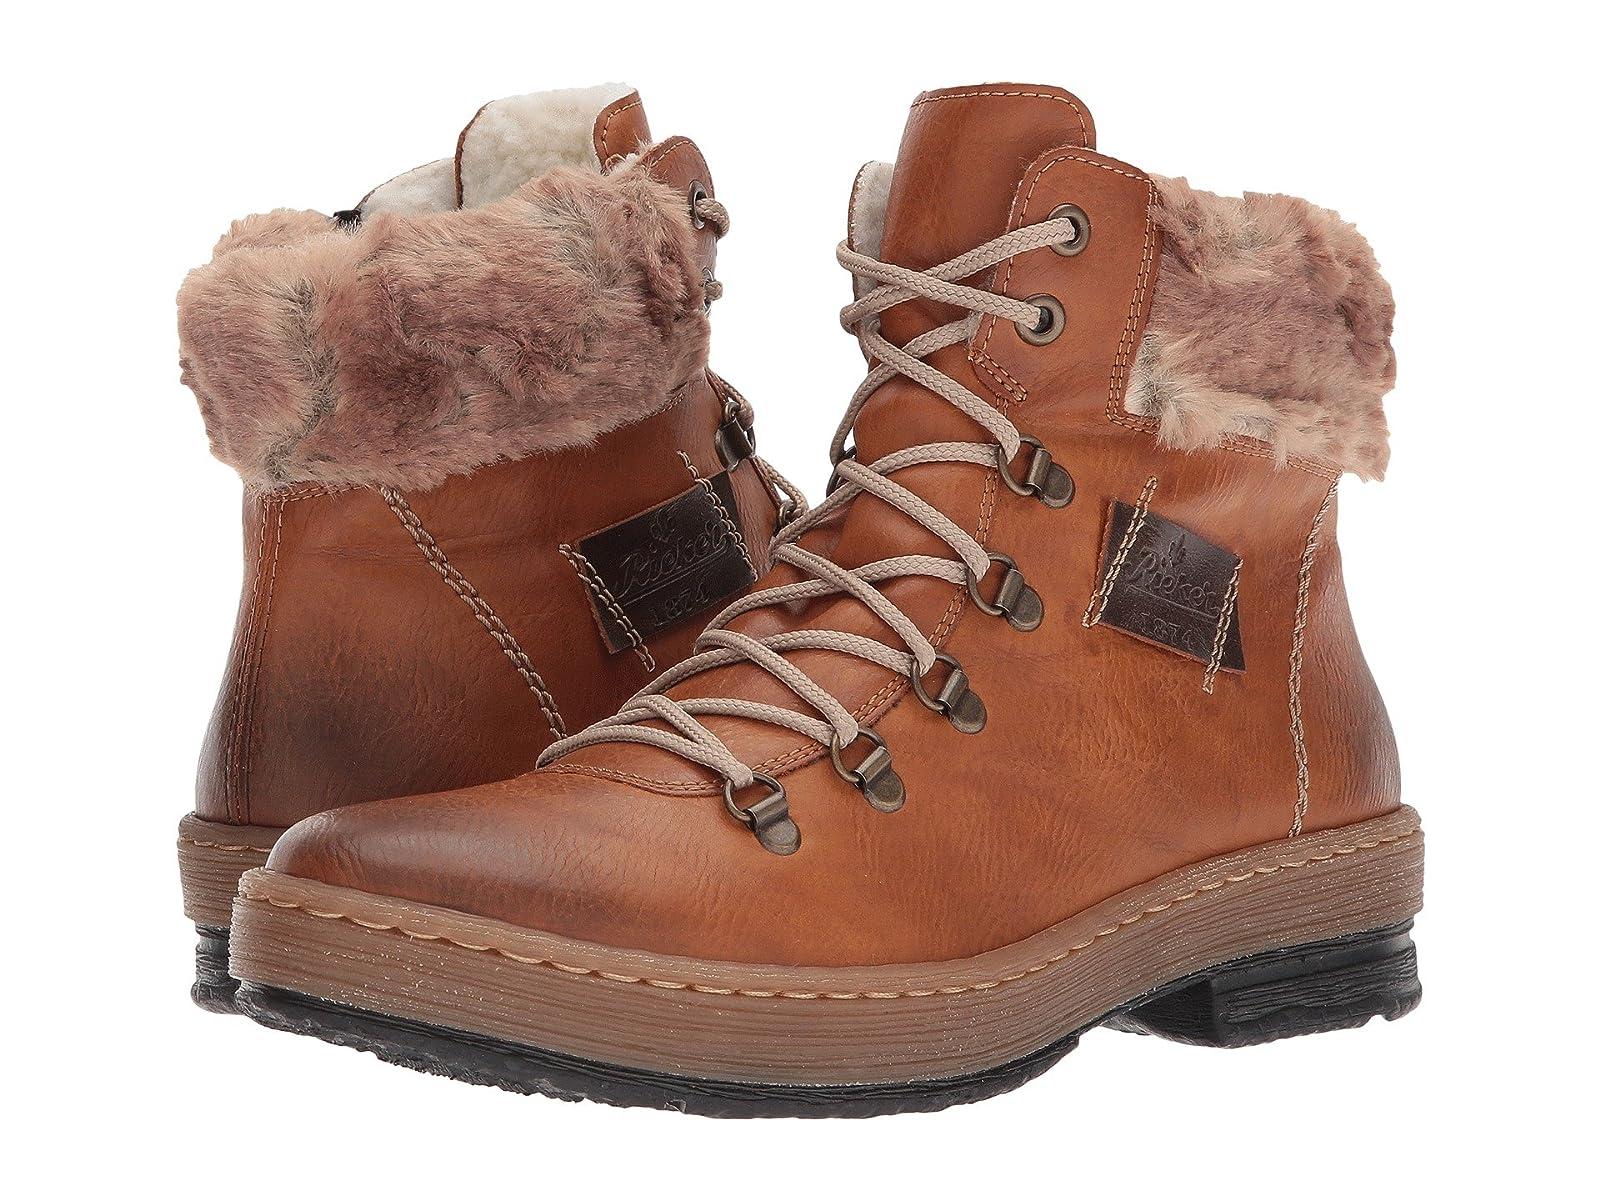 Rieker Z6743 Felicitas 43Economical and quality shoes